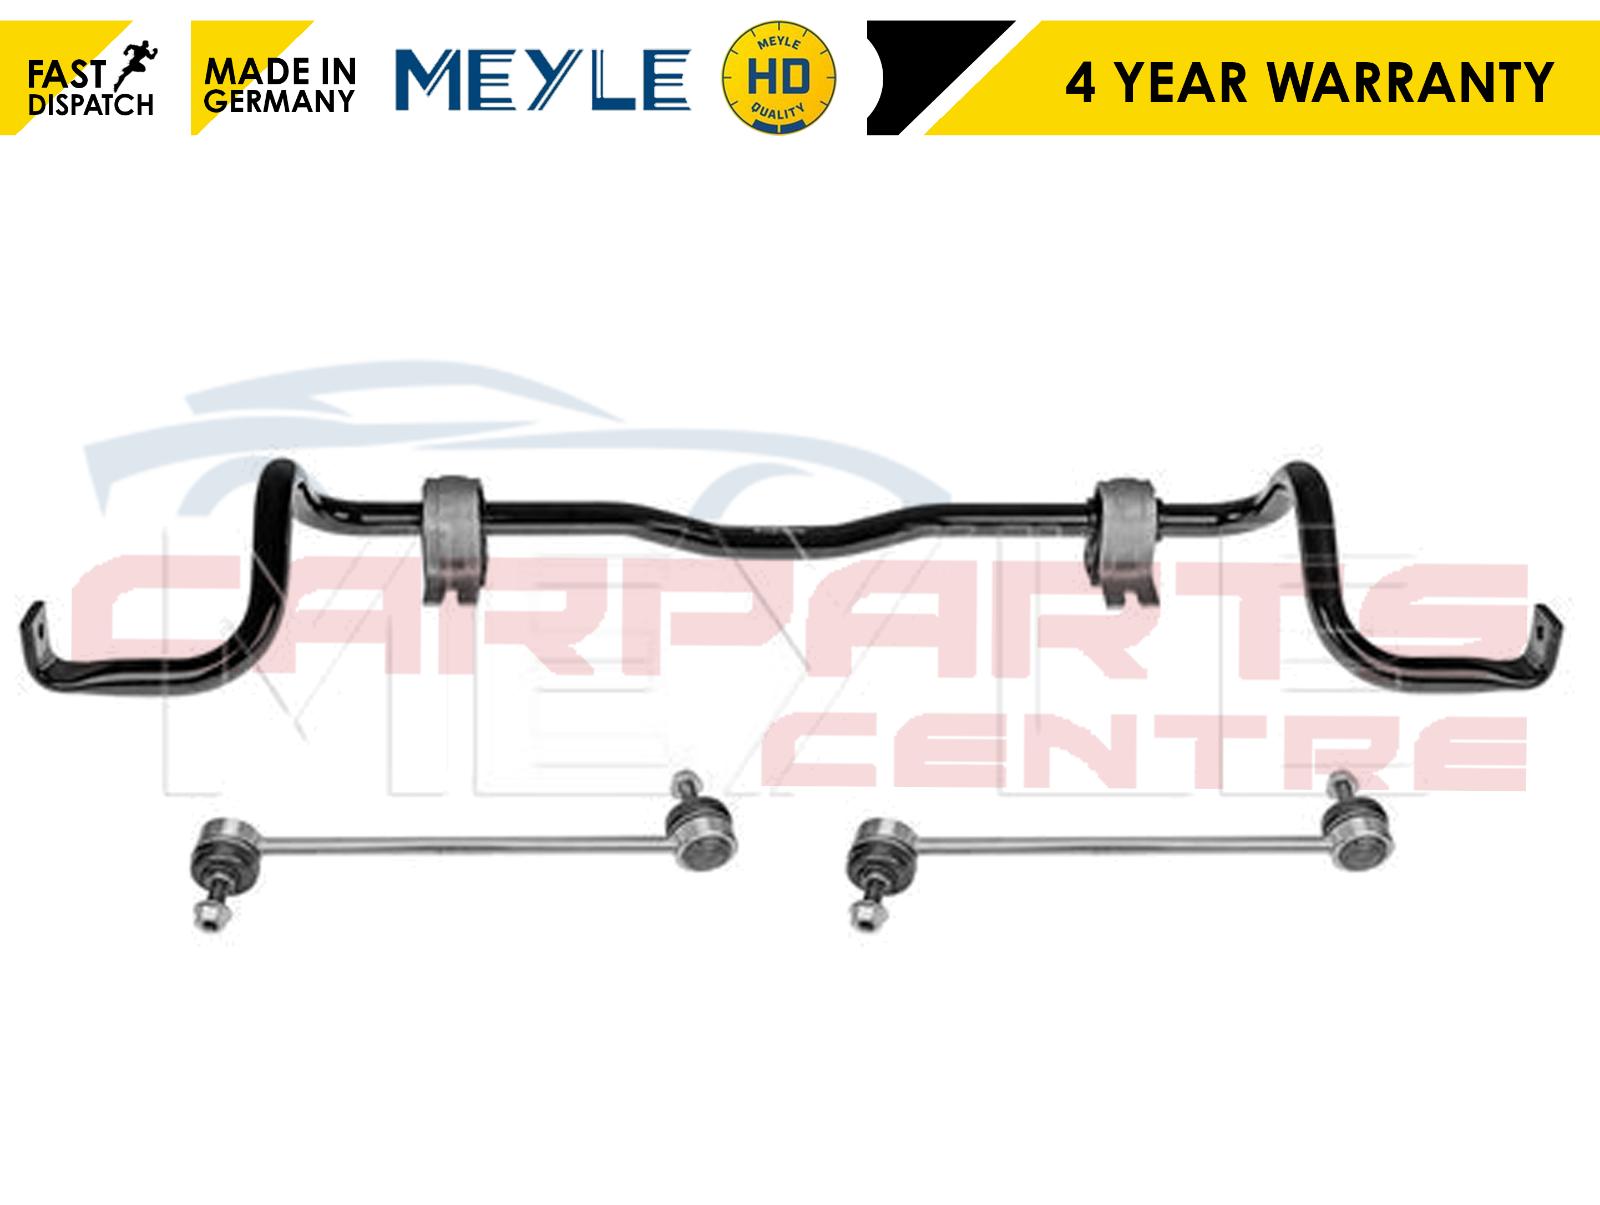 Motor Wiring Diagram Also Renault Scenic Megane Extra Clio Rover